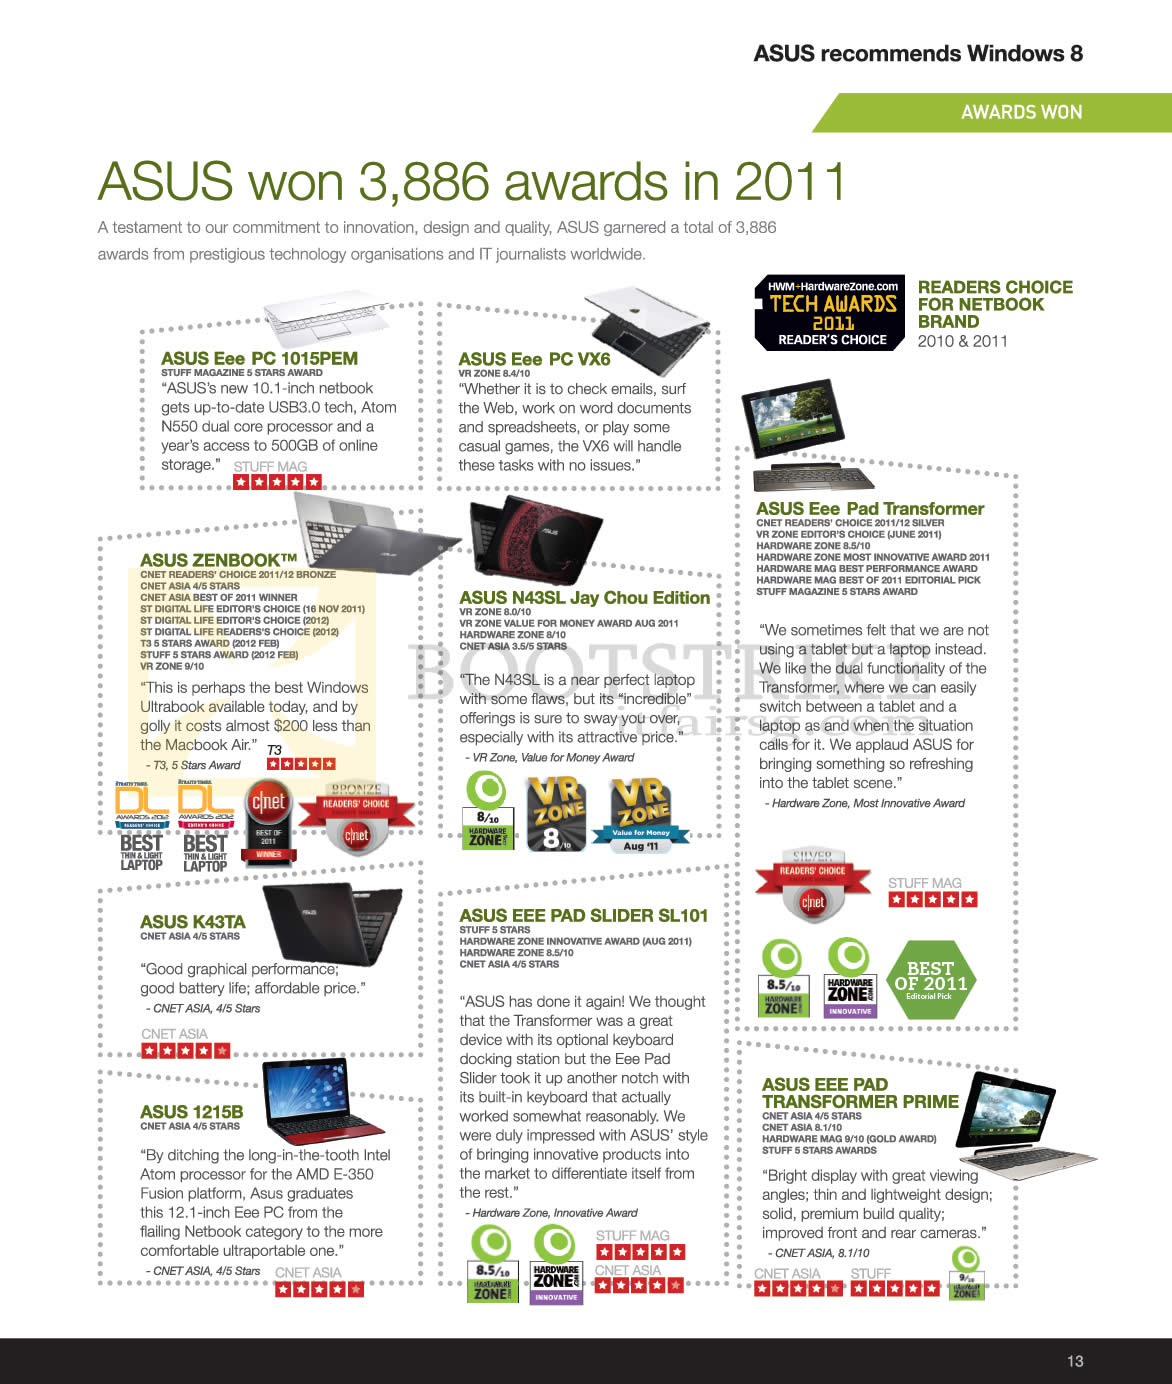 SITEX 2012 price list image brochure of ASUS Awards Won